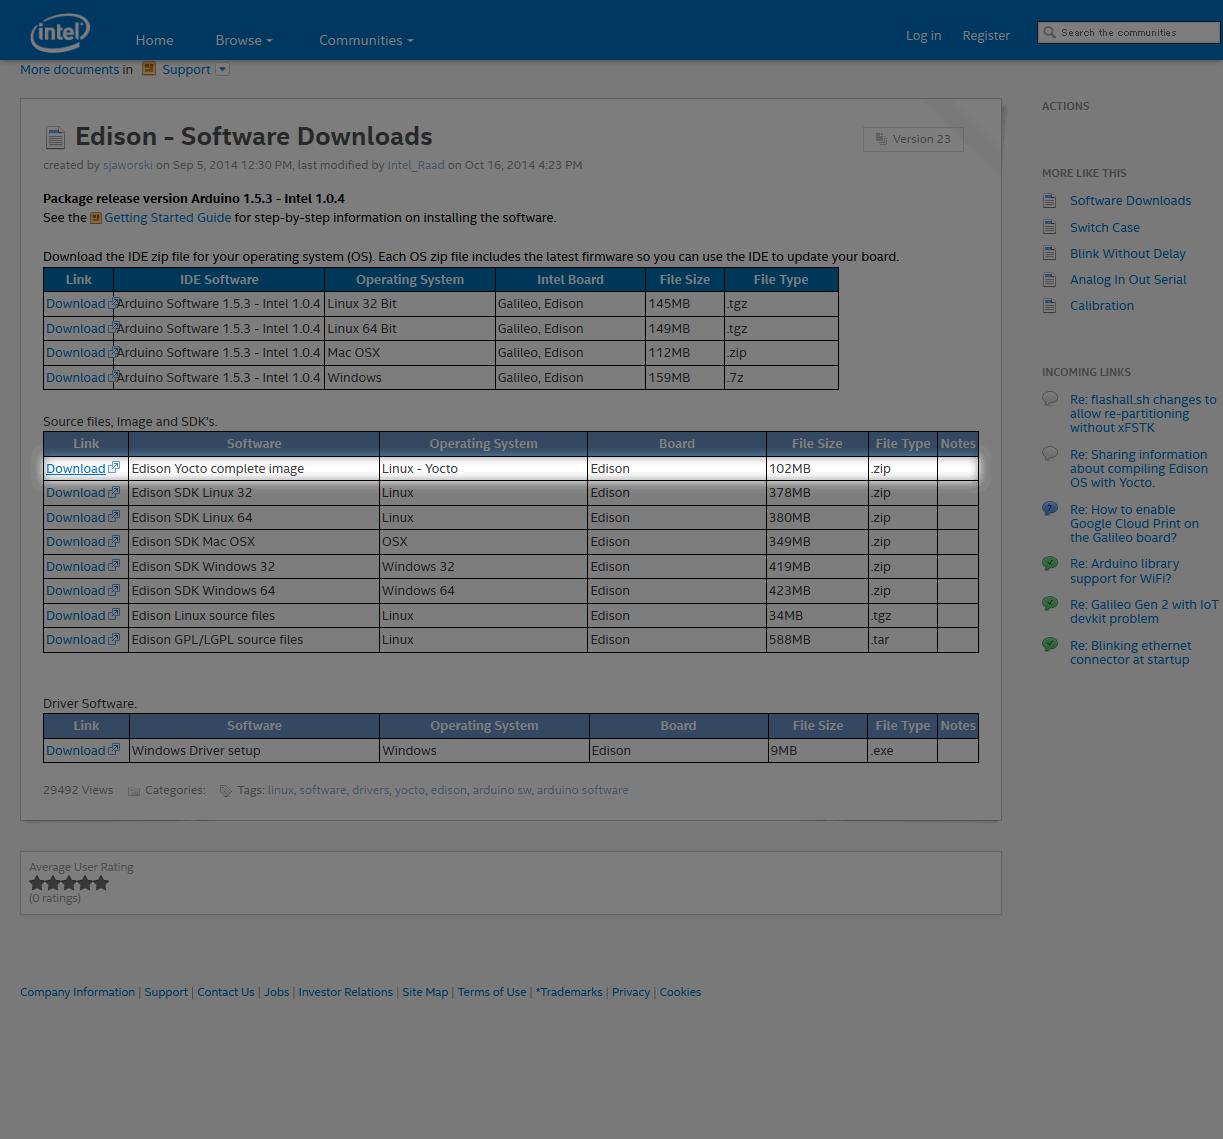 Edison Software Downloadsで選択するファイル